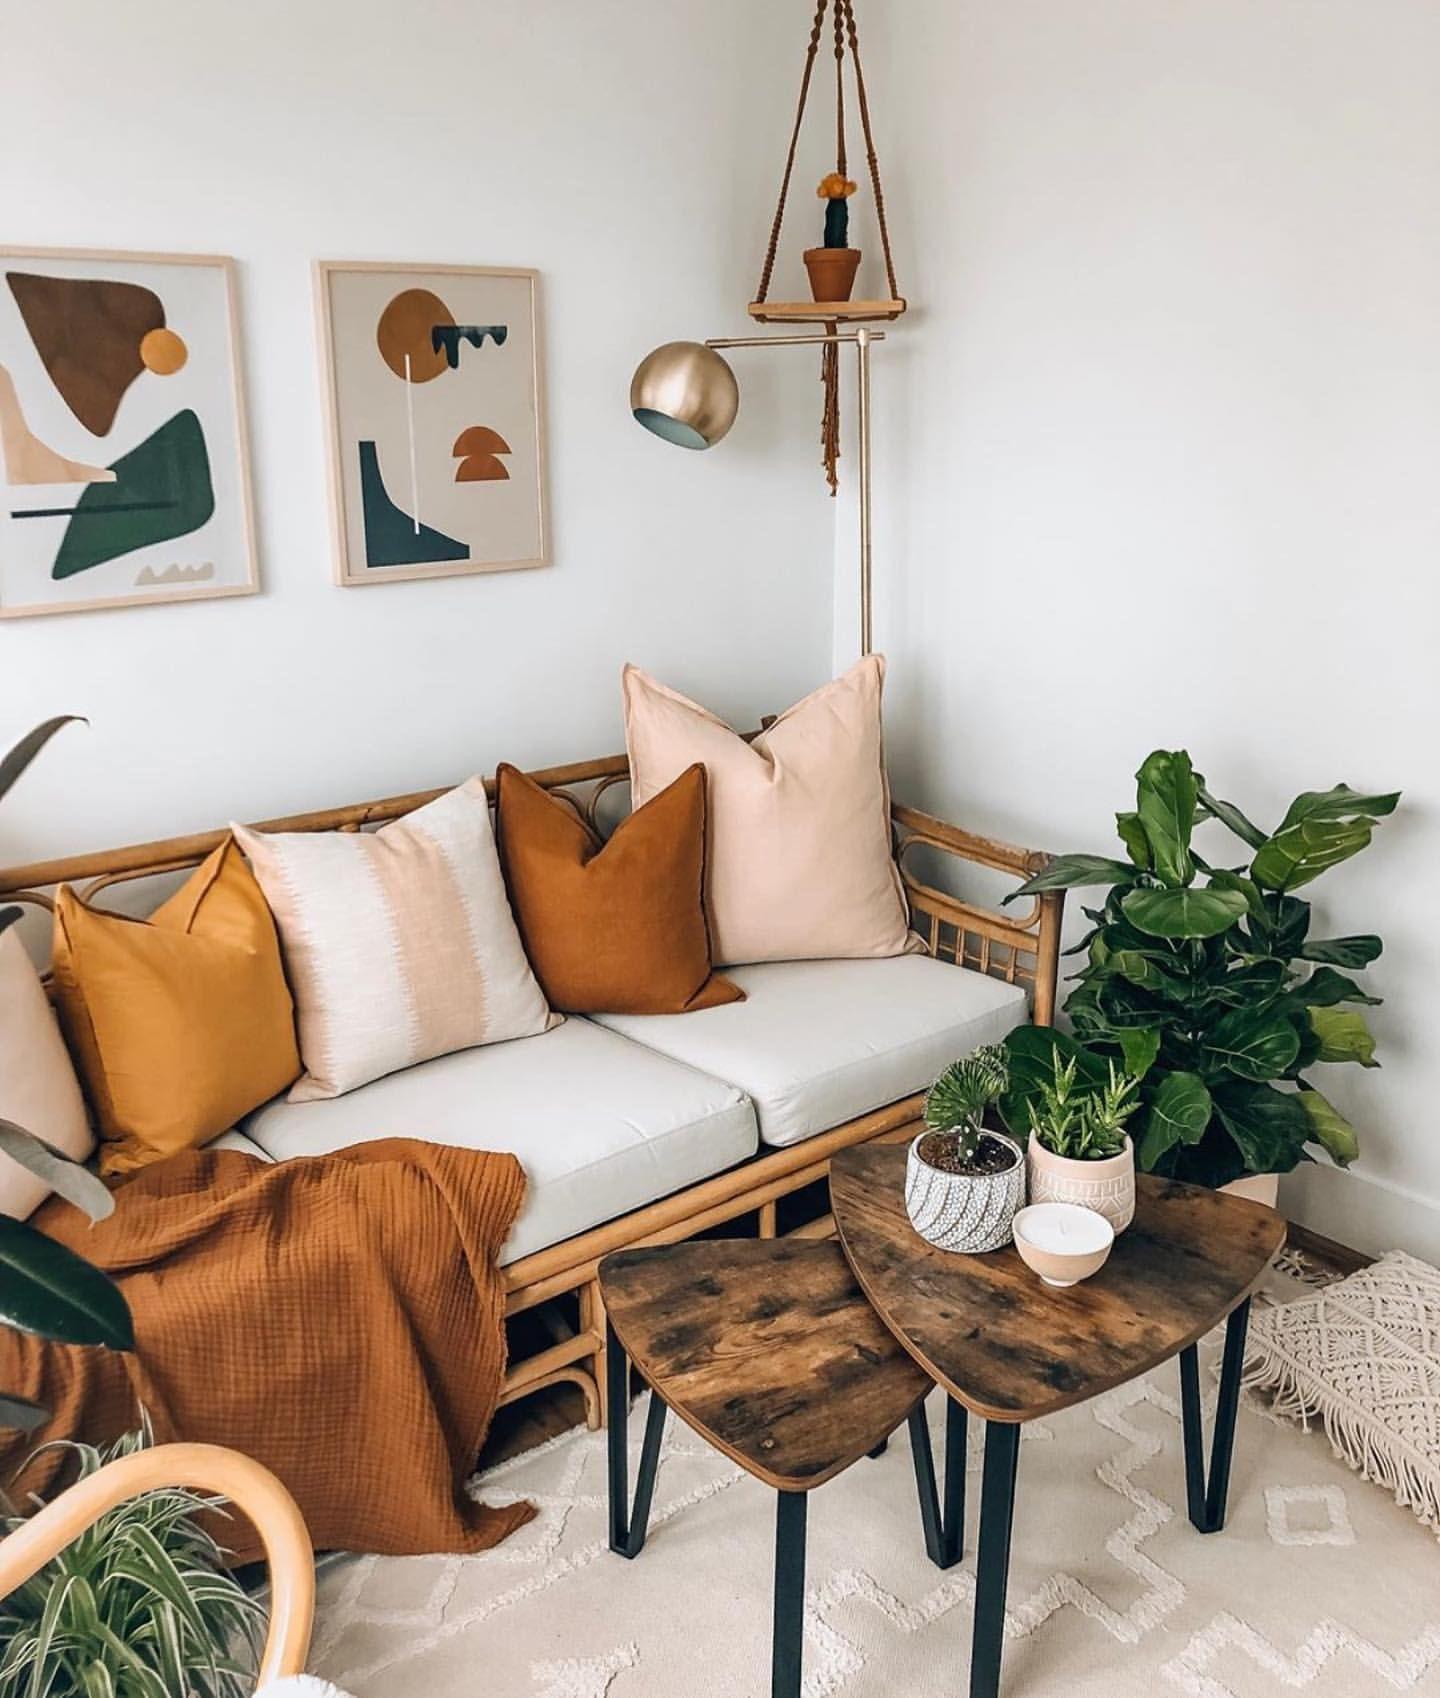 Pin On Living Room Decor Ideas #orange #living #room #accents